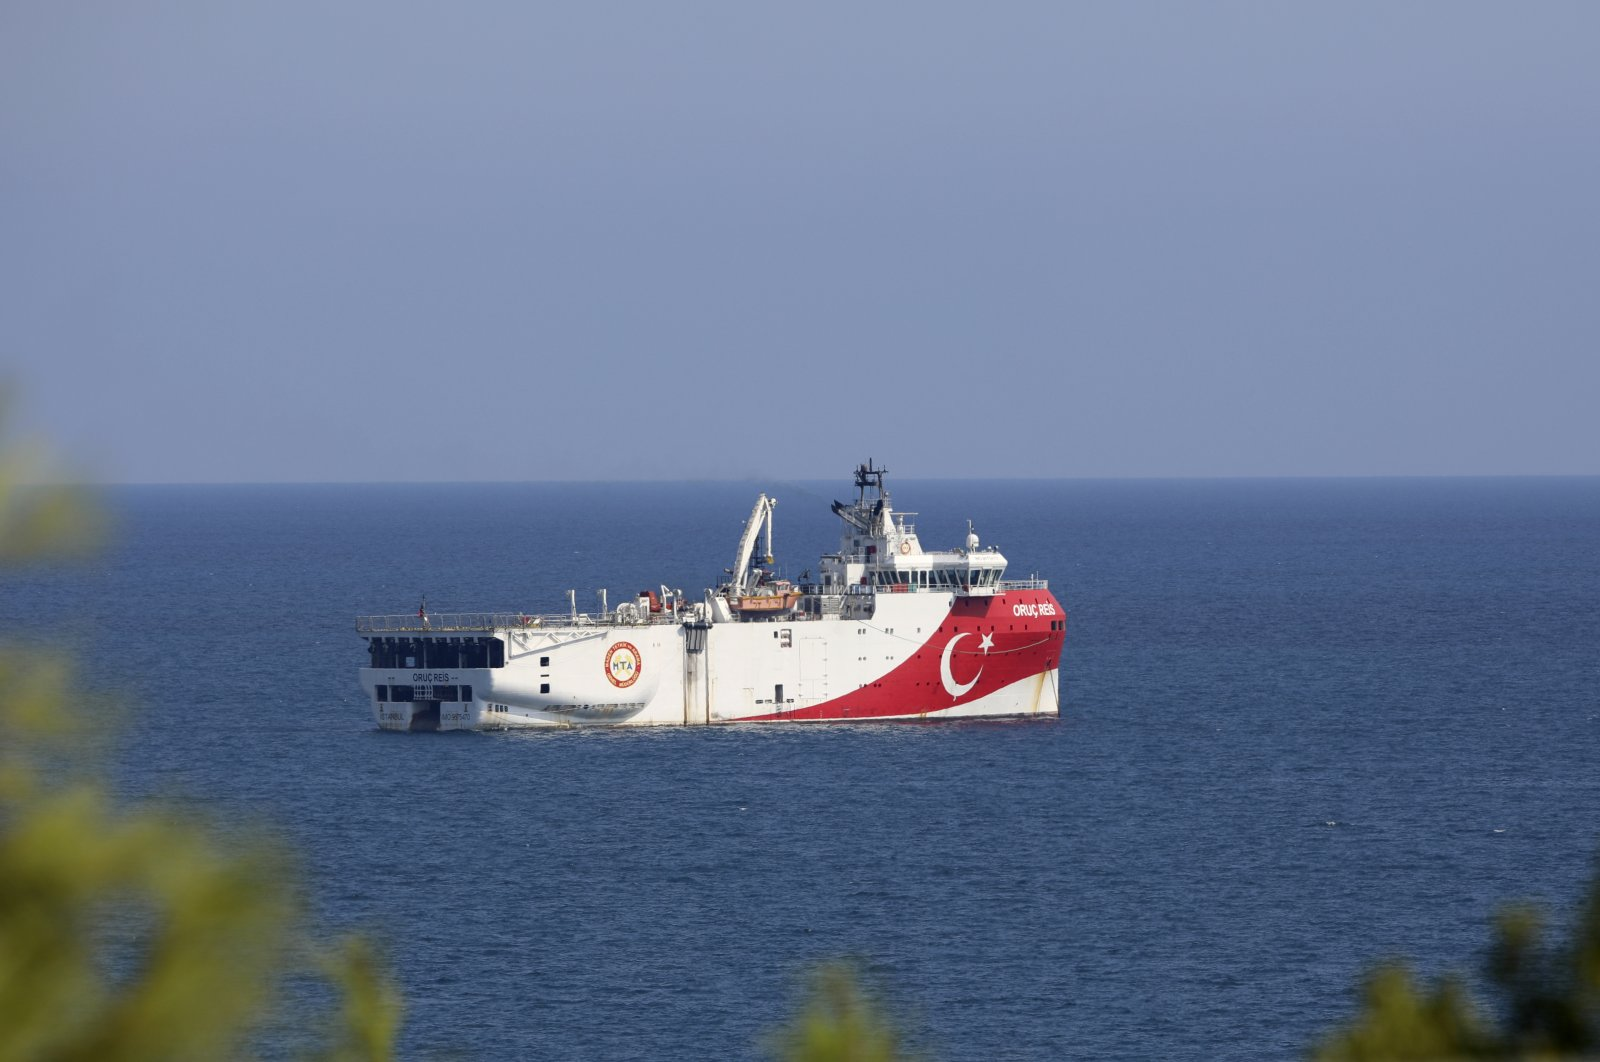 Turkey's research vessel Oruç Reis anchored in the Mediterranean off the coast of Antalya, Turkey, Sept. 13, 2020. (AP Photo)